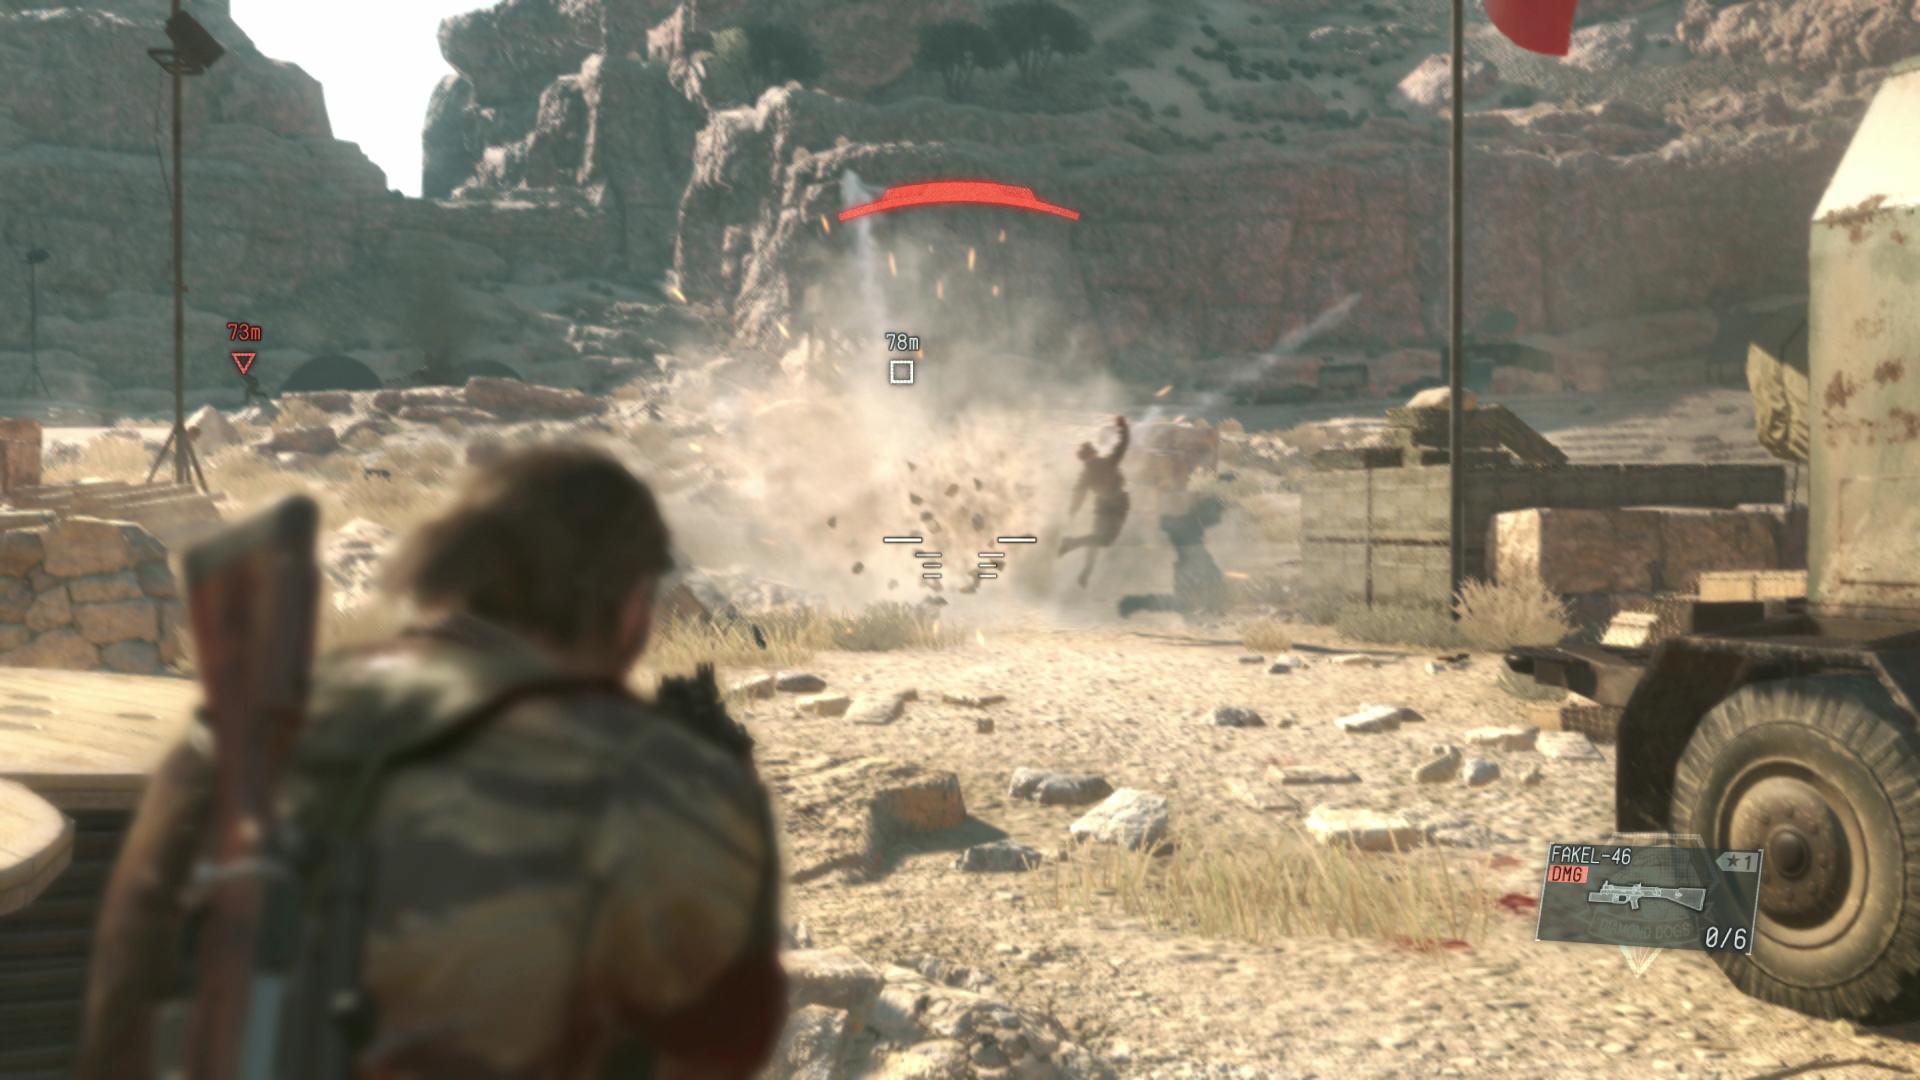 20 minut z Metal Gear Solid V: The Phantom Pain 109821